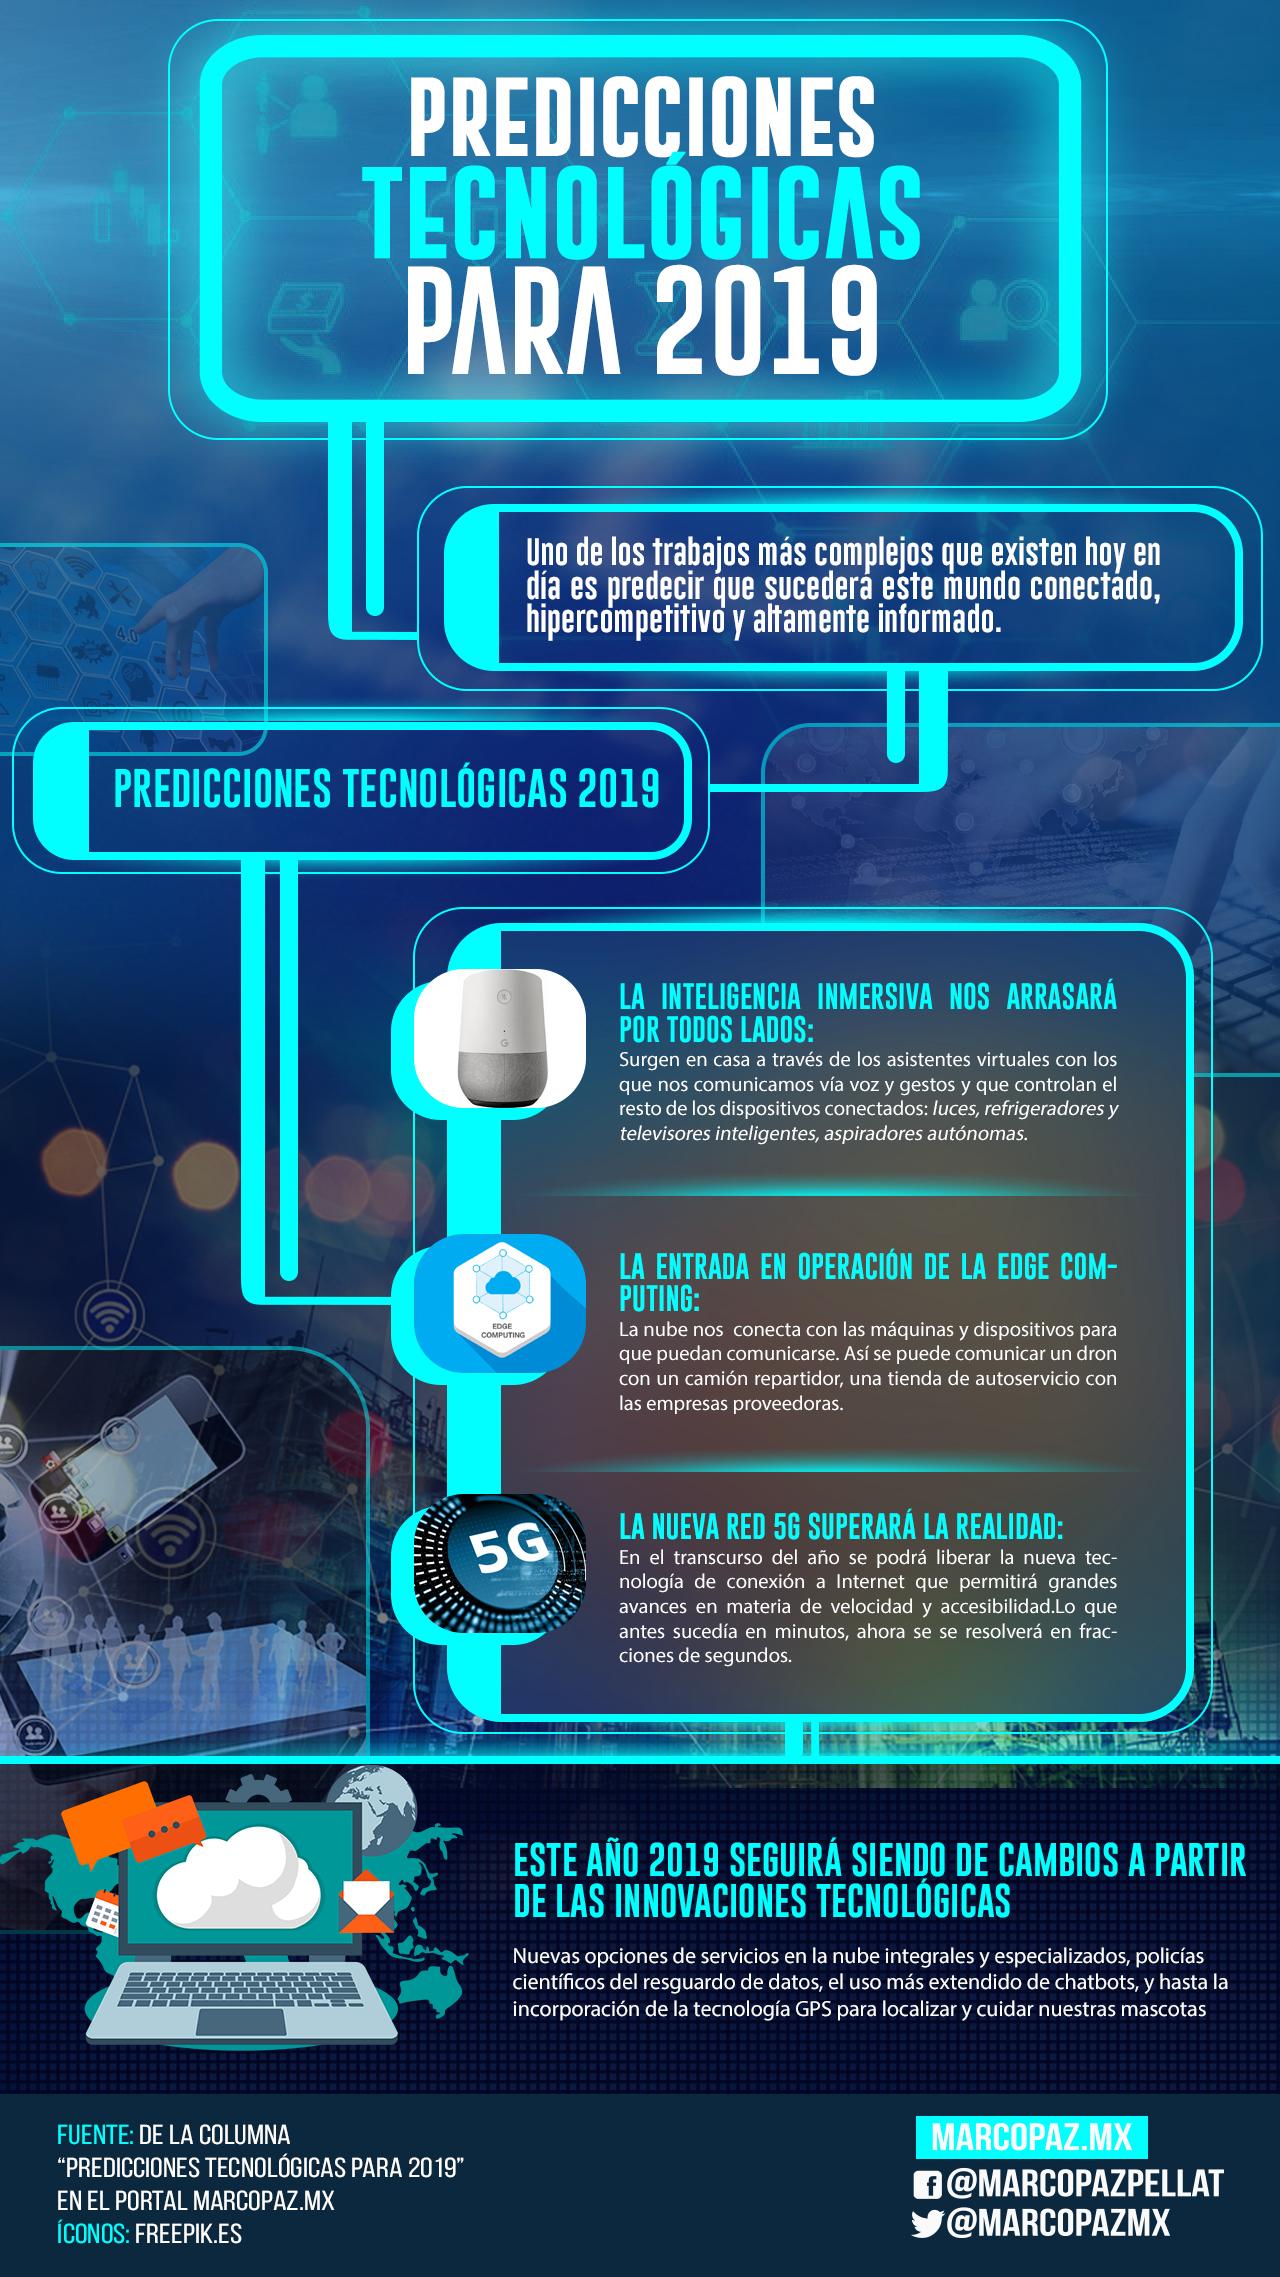 82_INFOGRAFIA_Predicciones tecnológicas para 2019